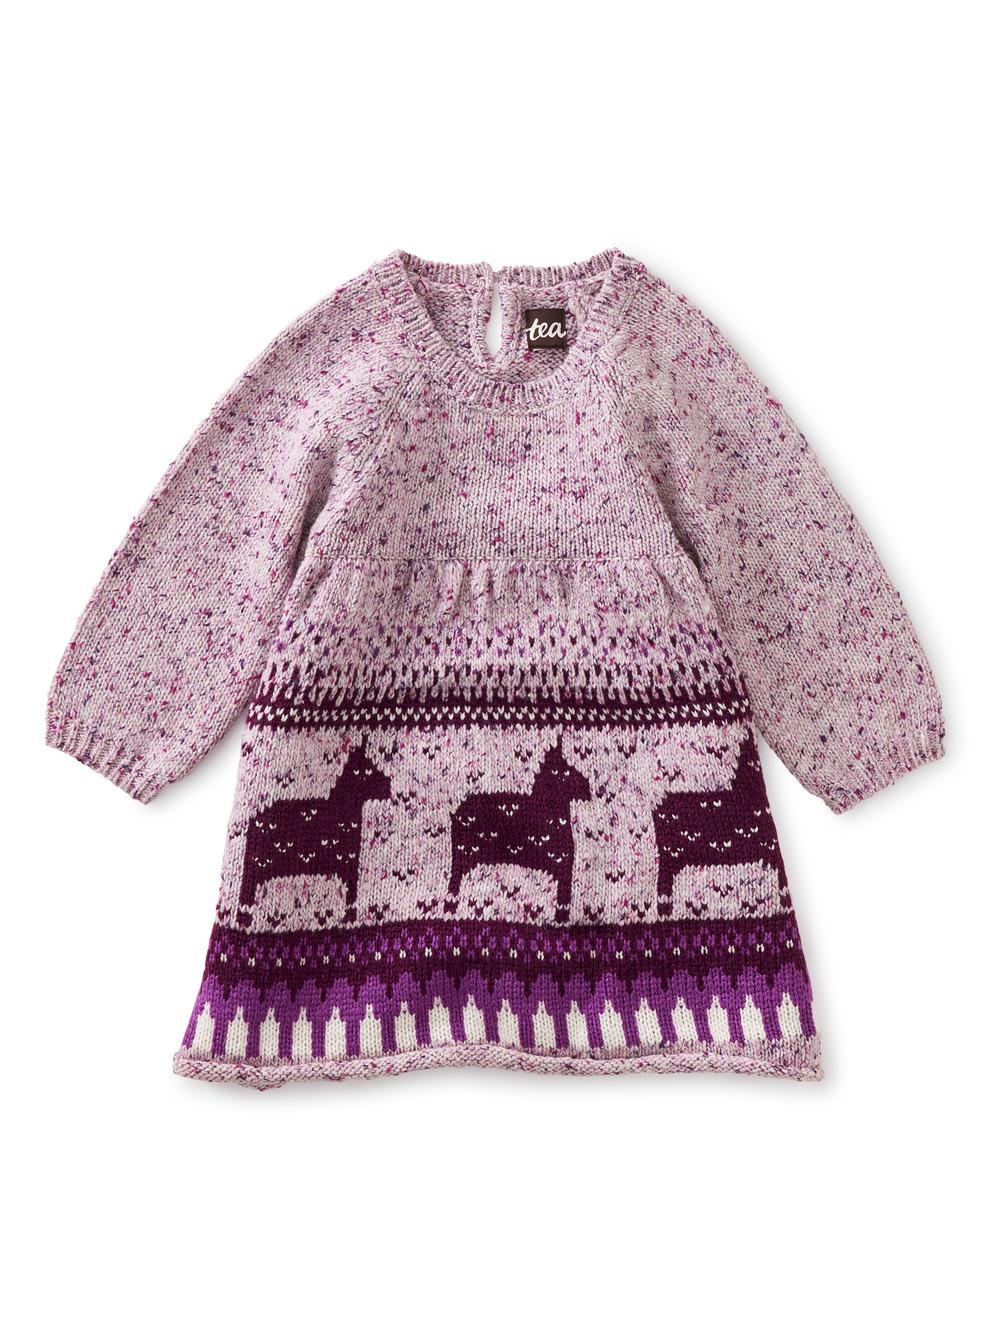 Dala Horse Baby Sweater Dress